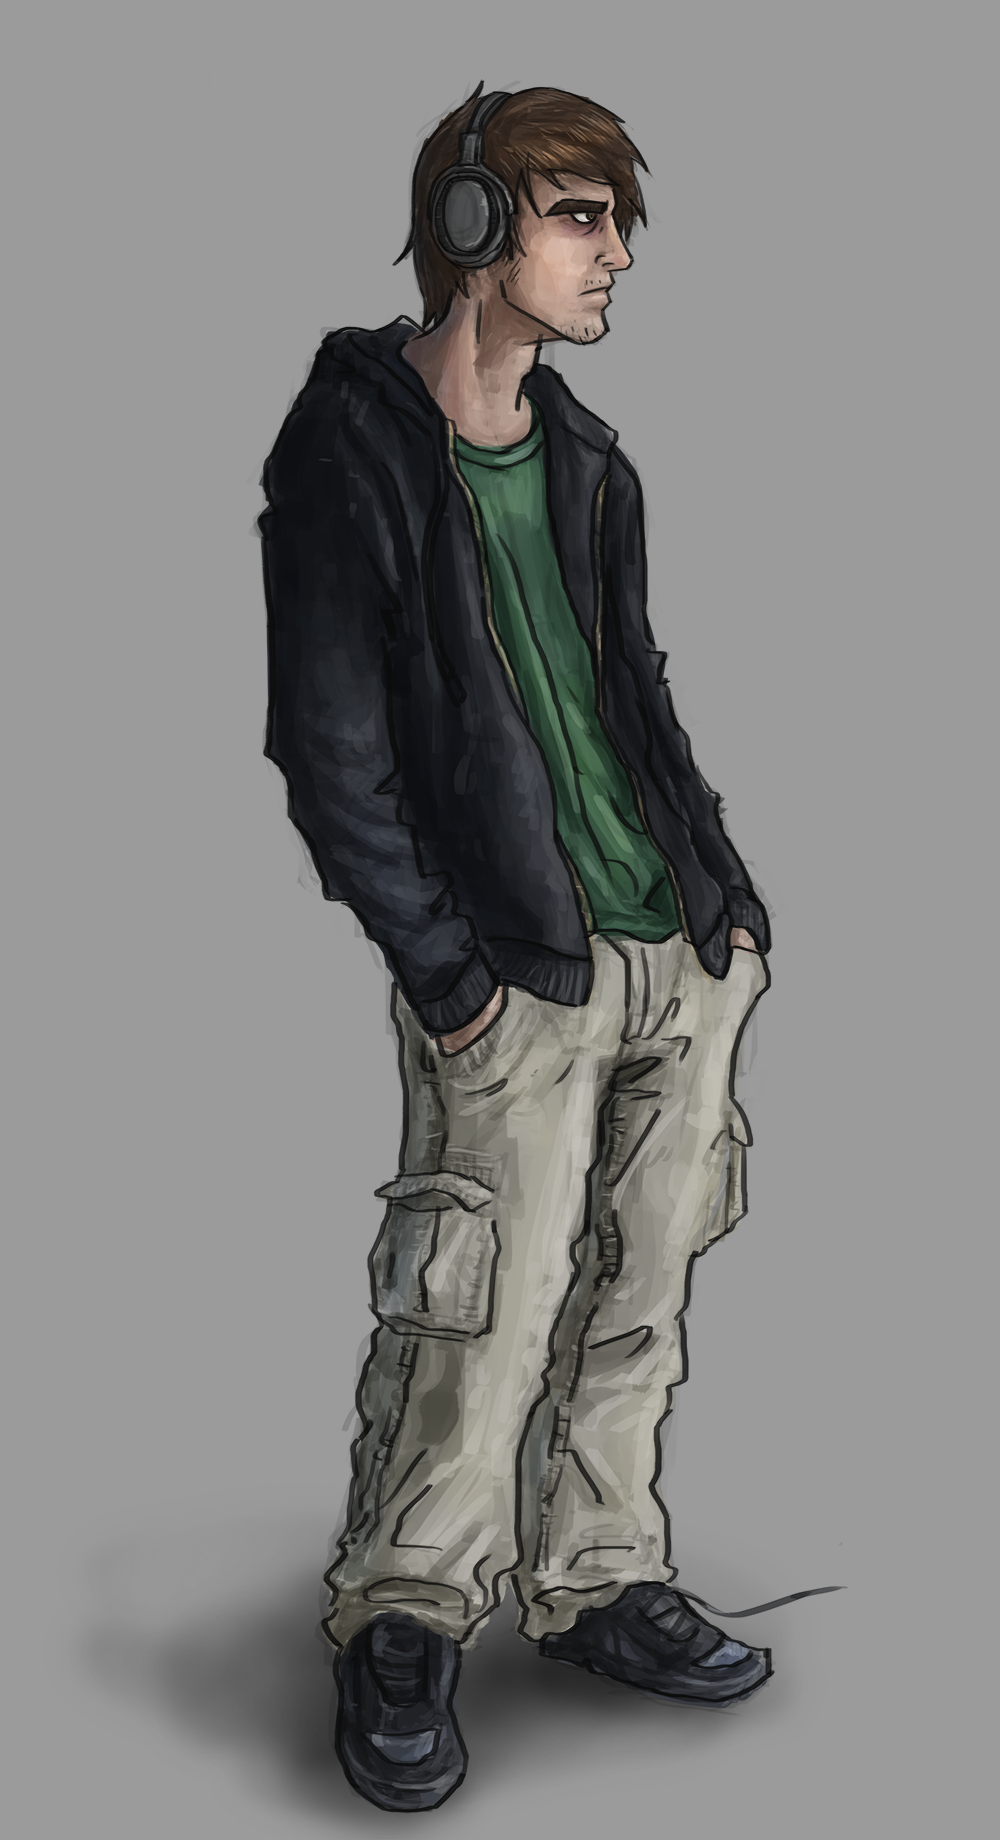 Quick Self-portrait